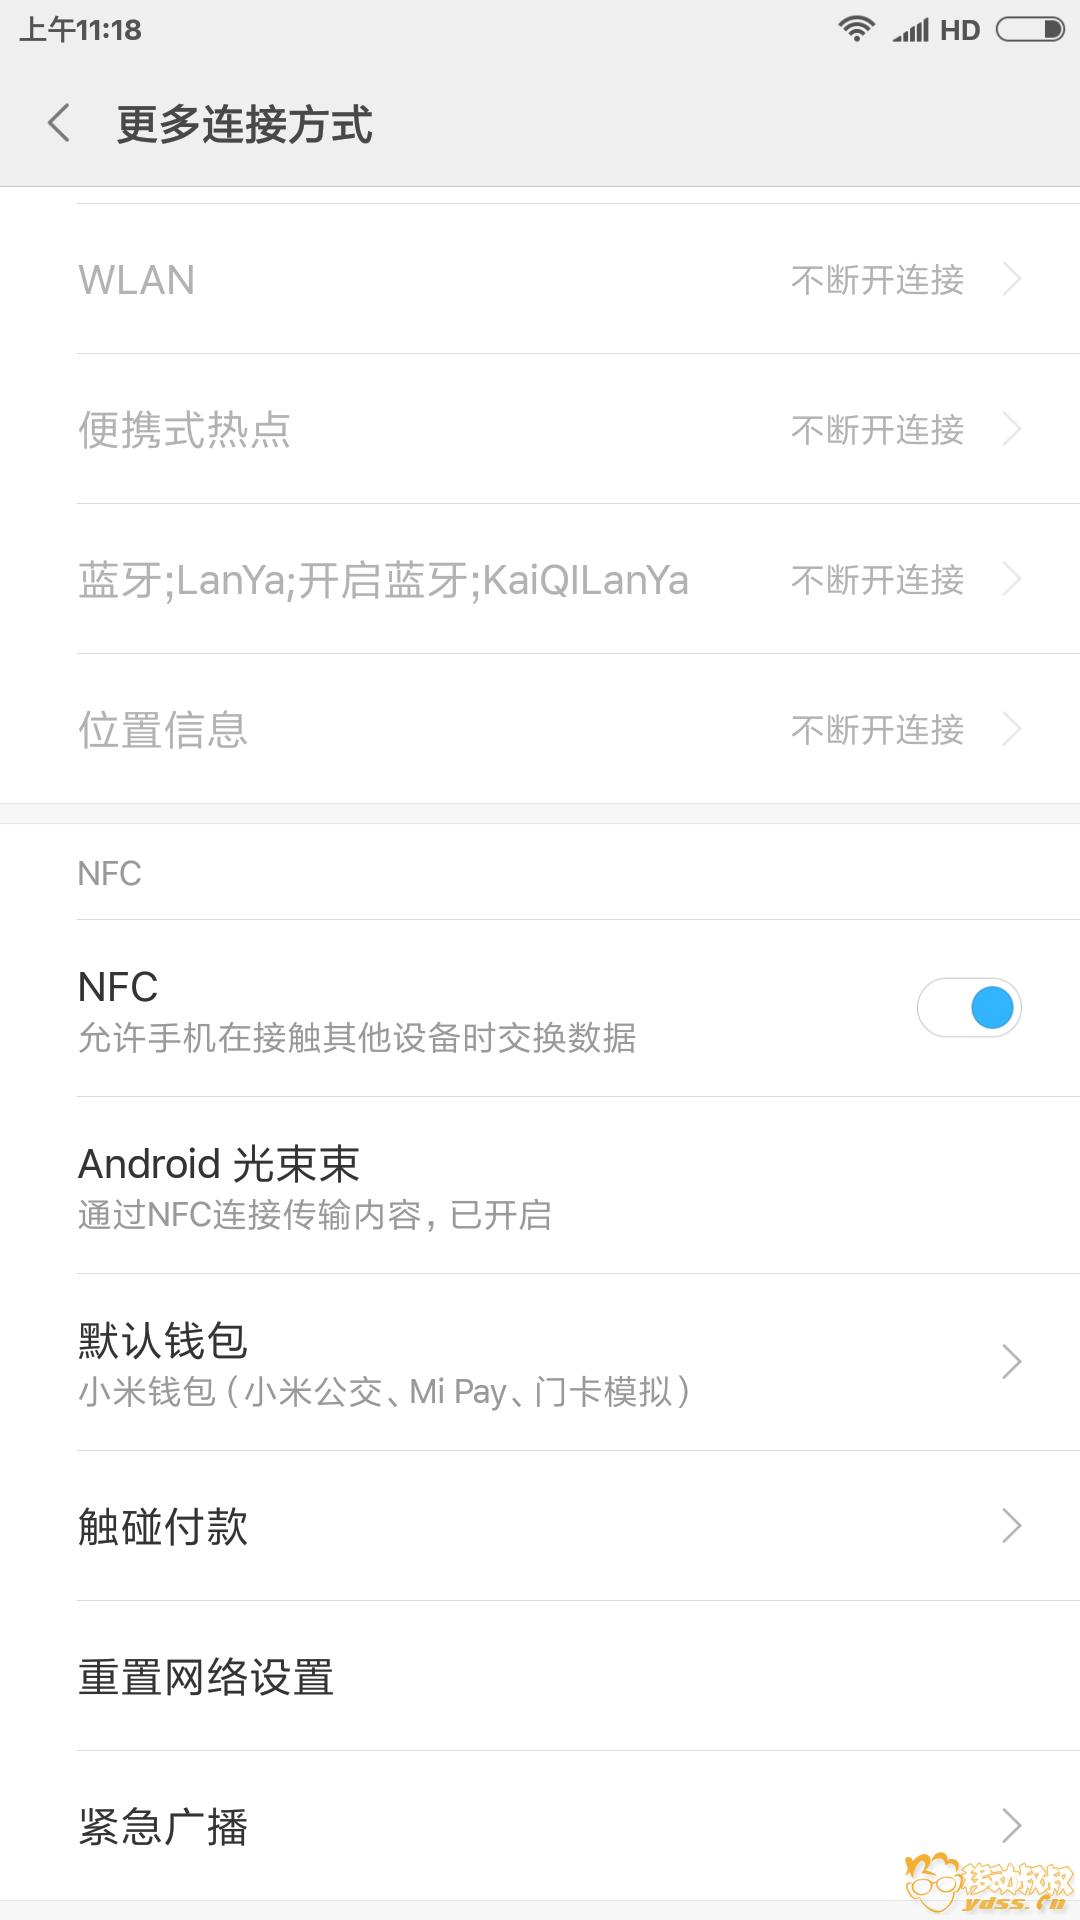 Screenshot_2018-05-04-11-18-57-897_com.android.settings.png